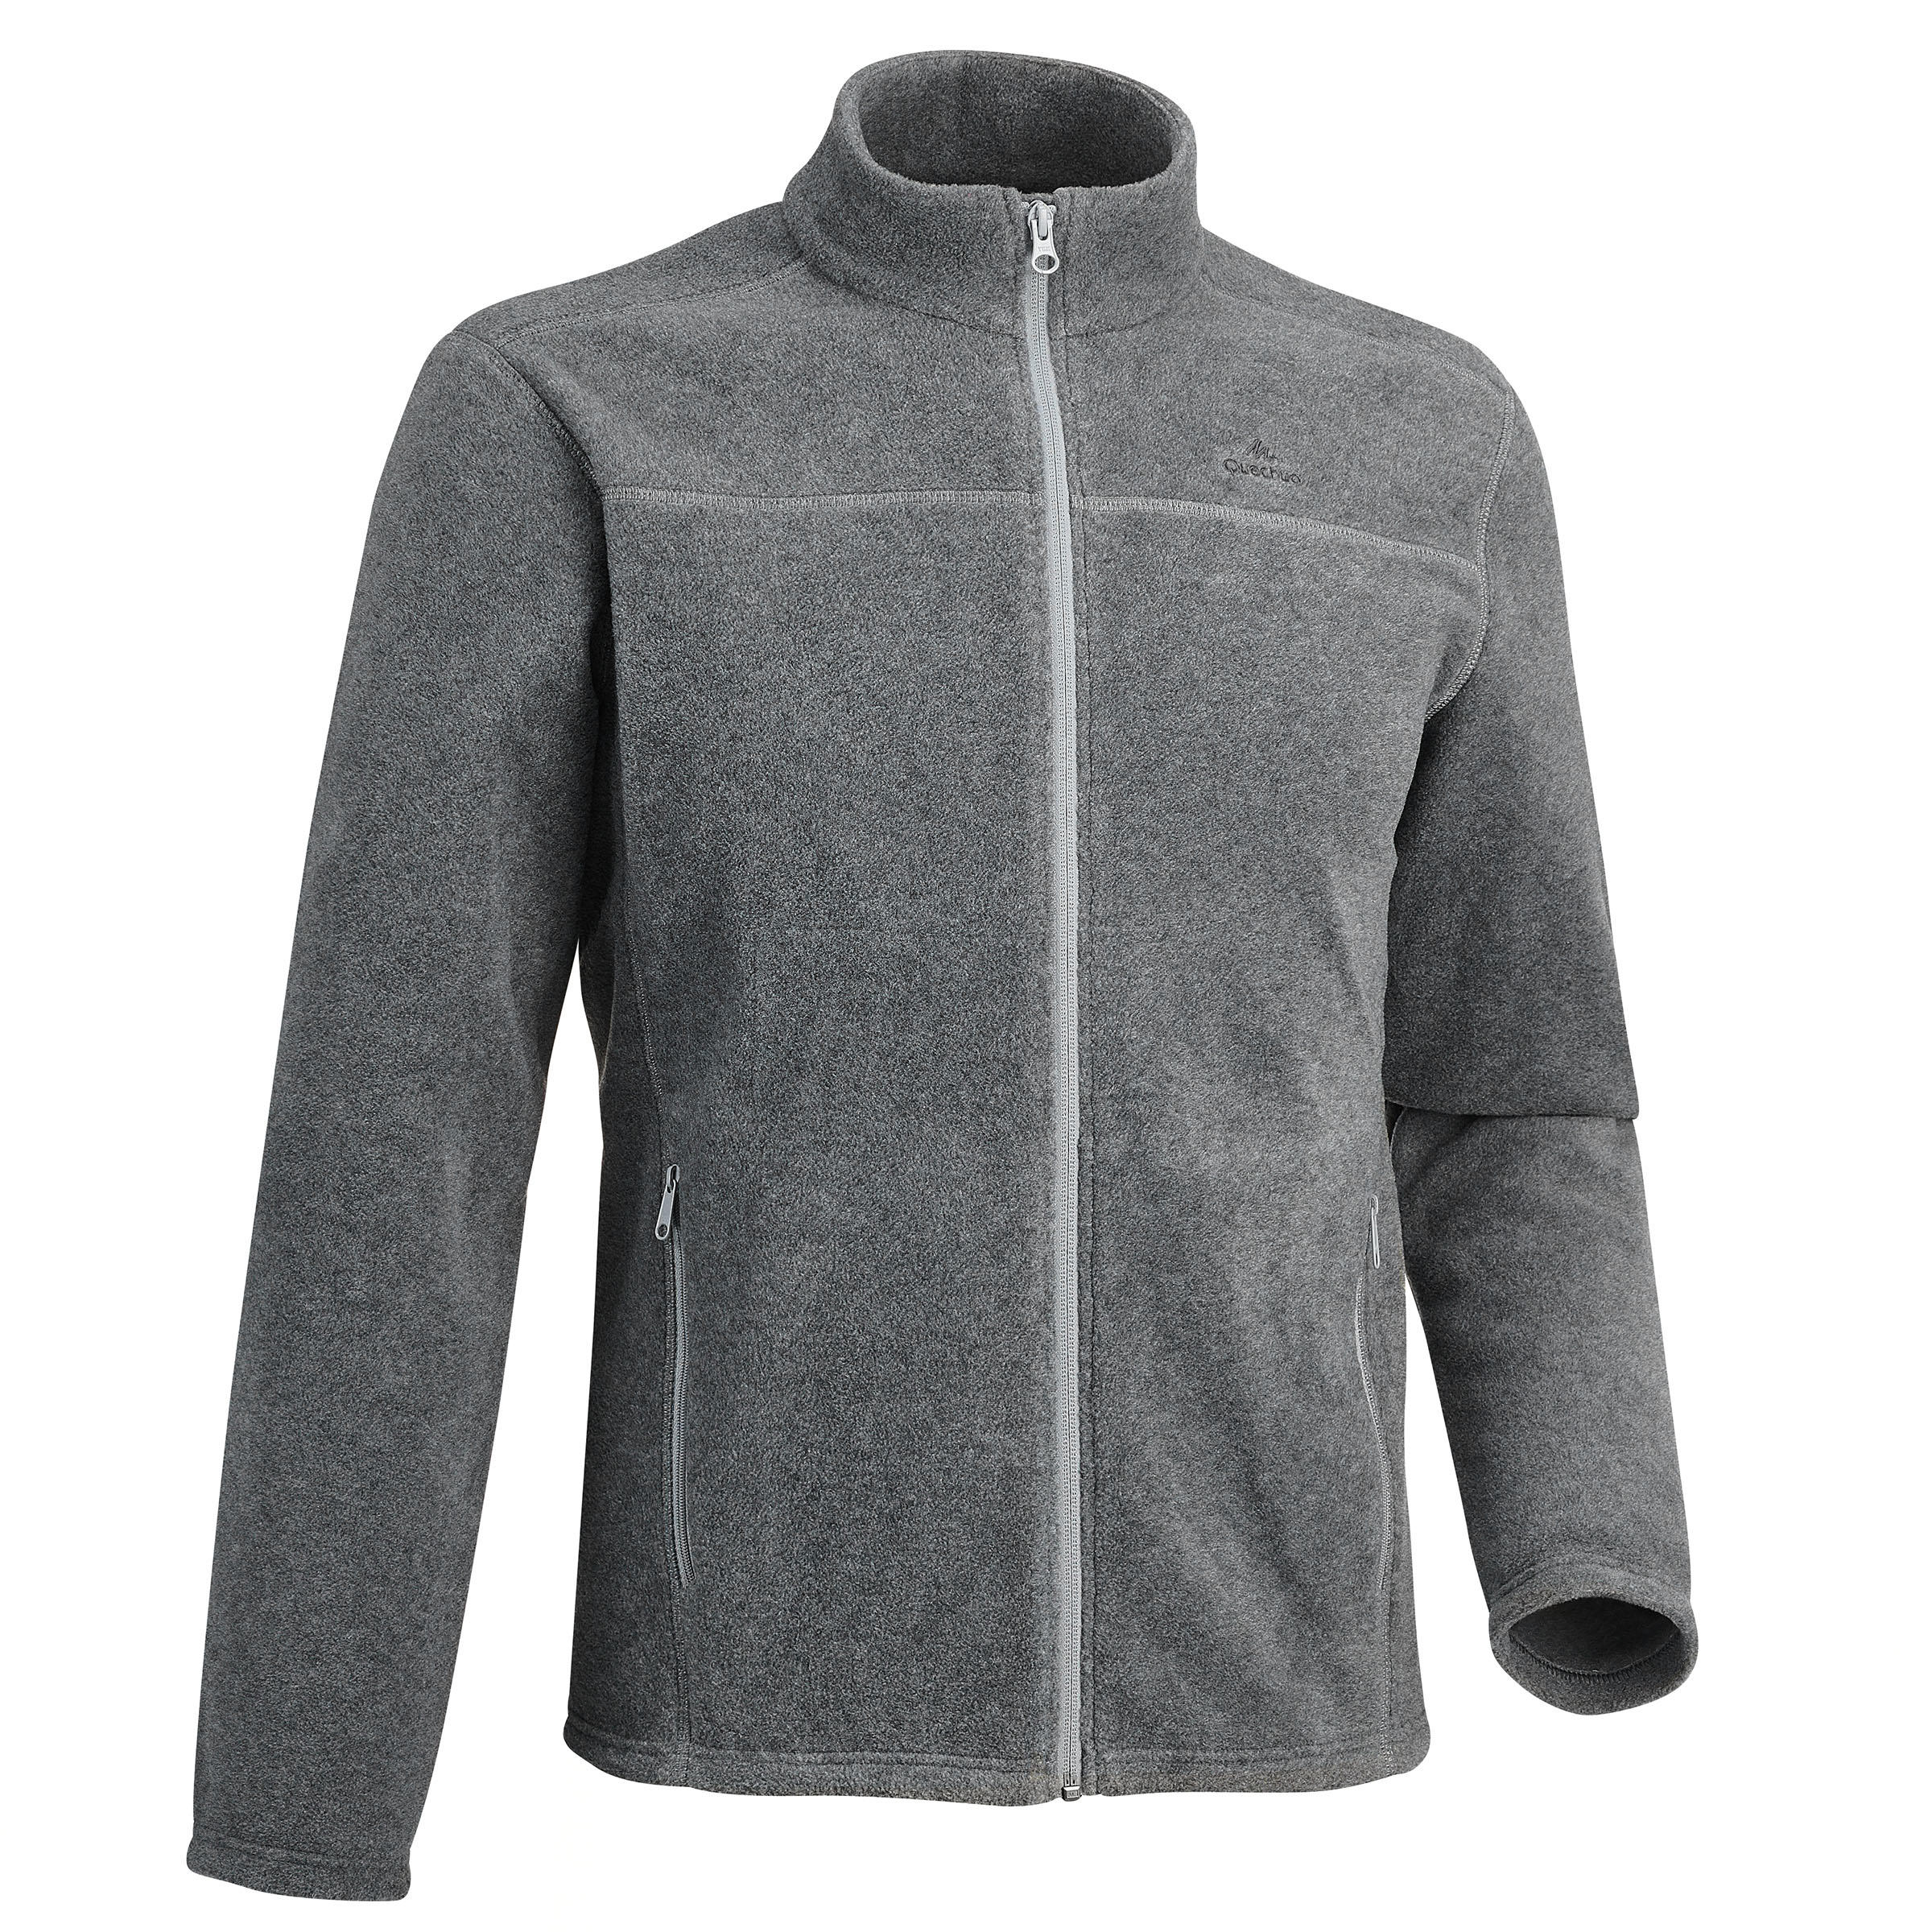 MH120 Men's Mountain Hiking Fleece Jacket - Mottled Grey